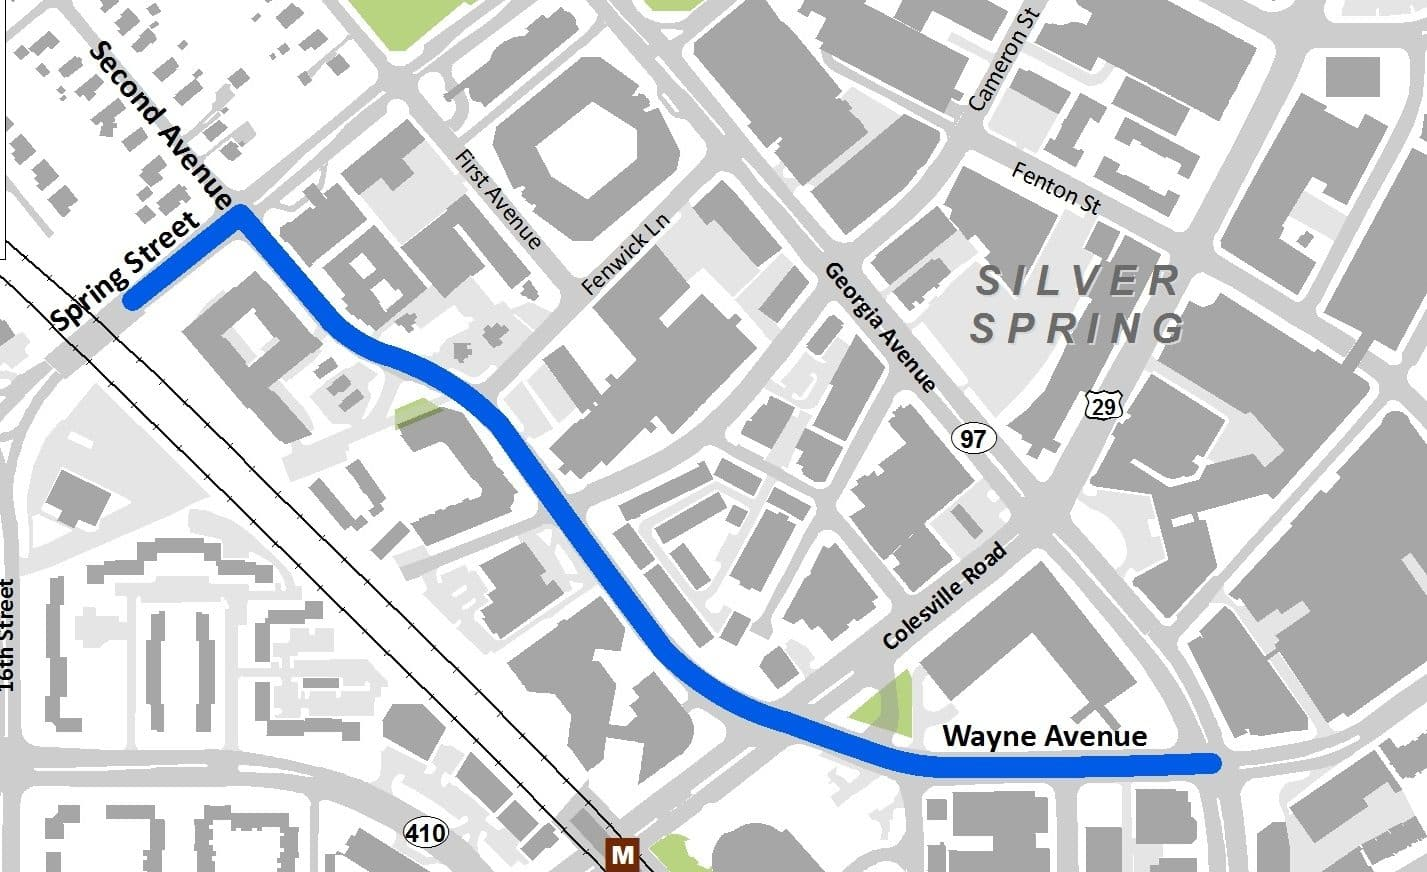 More Detail on Silver Springs Second Wayne Avenue Bike Lanes